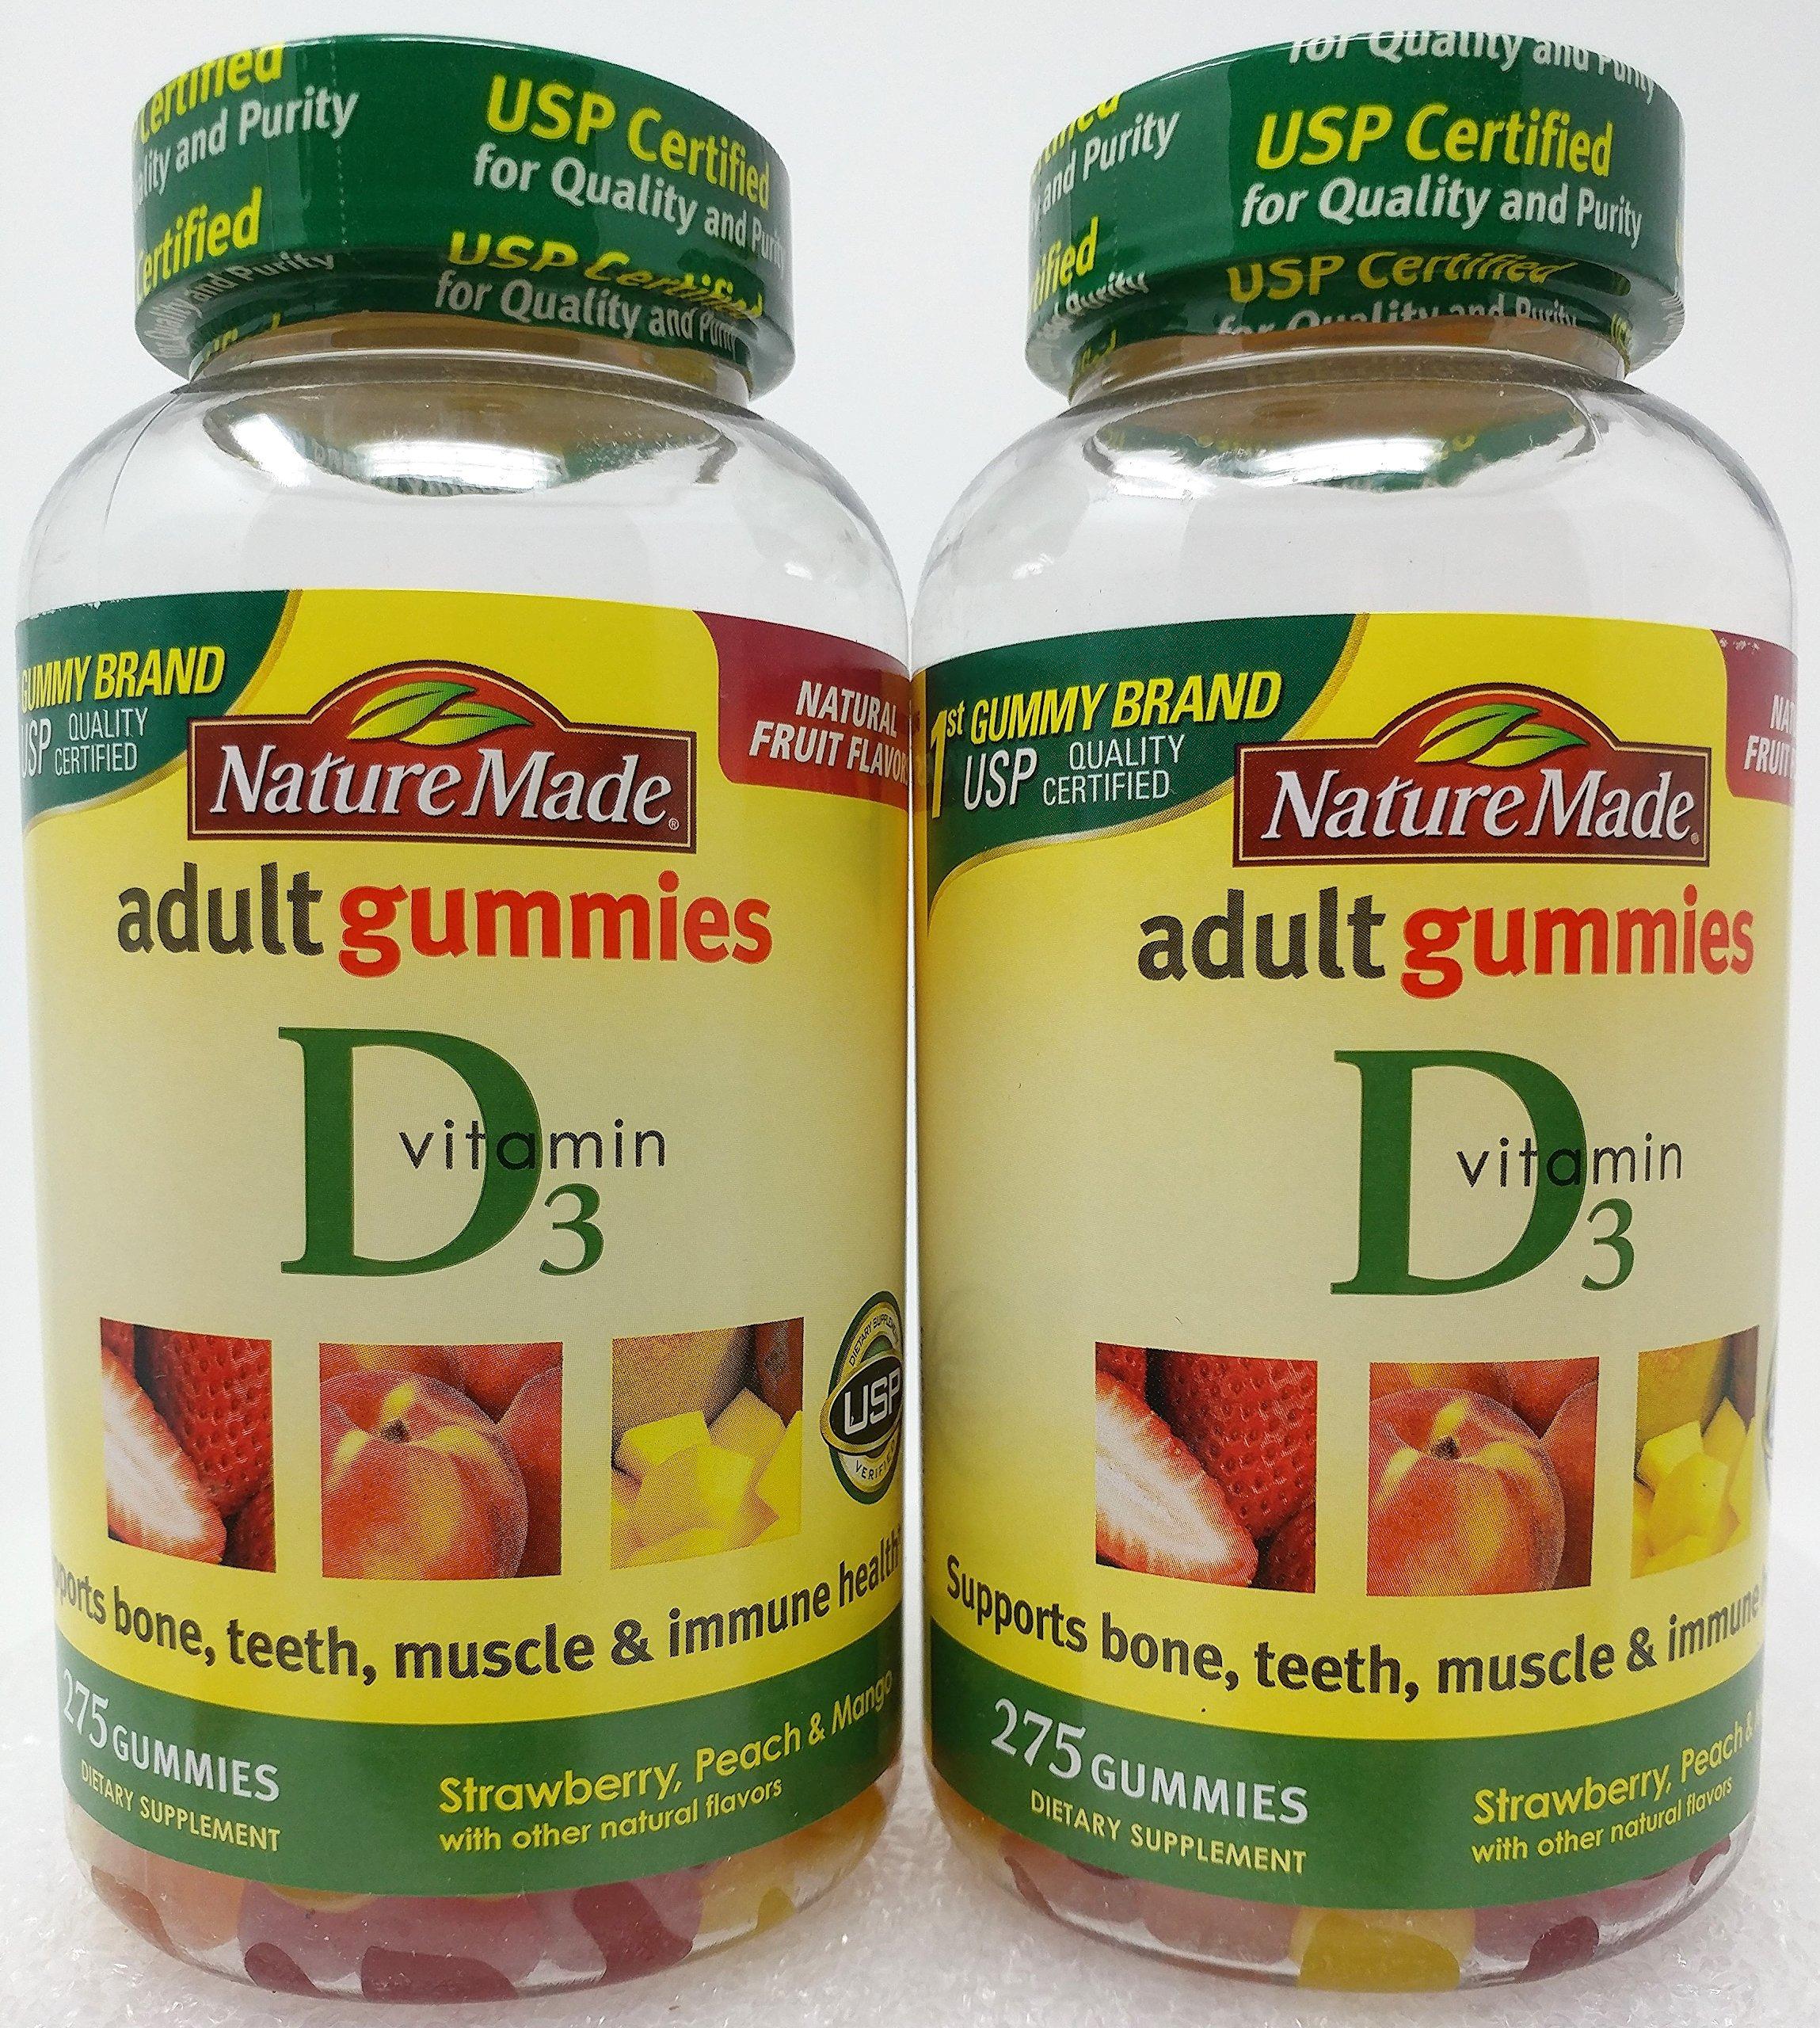 Nature Made Vitamin D3 Adult Gummies 275 Gummies (pack of 2)